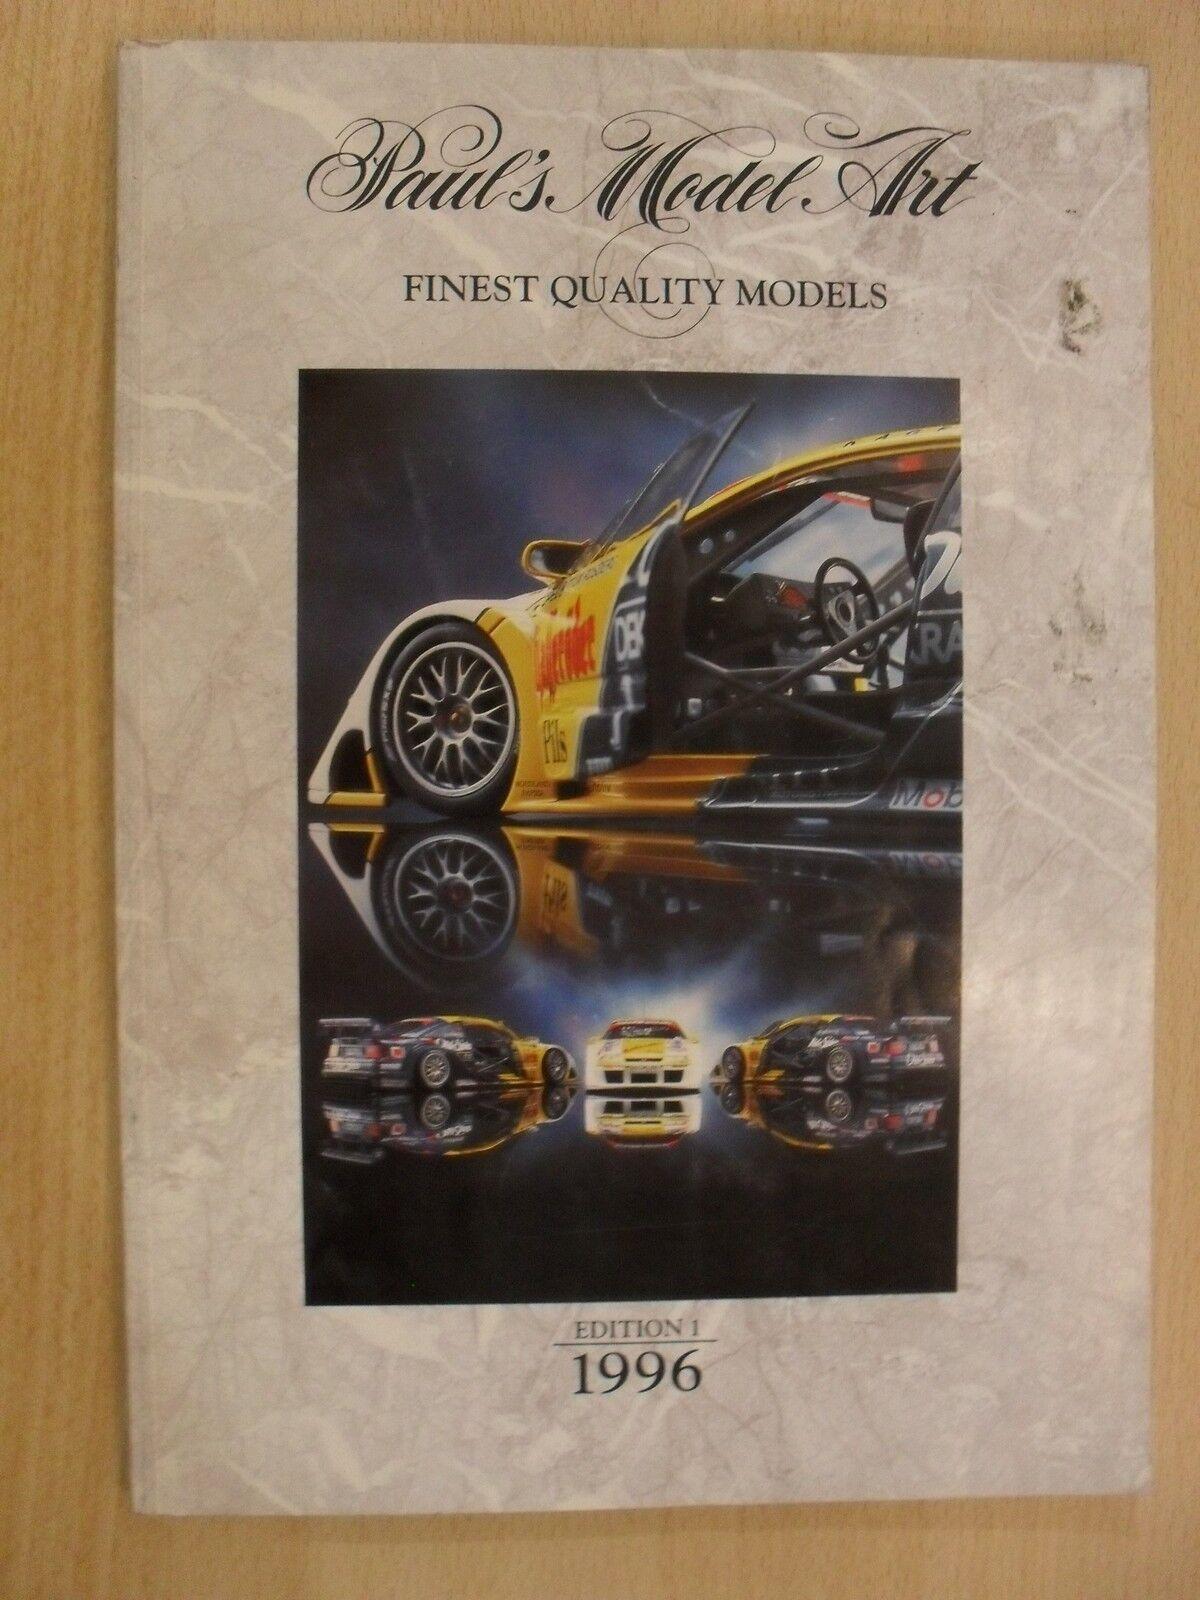 PAUL'S MODEL ART - FINEST QUALITY MODELS - EDITION 1 1996